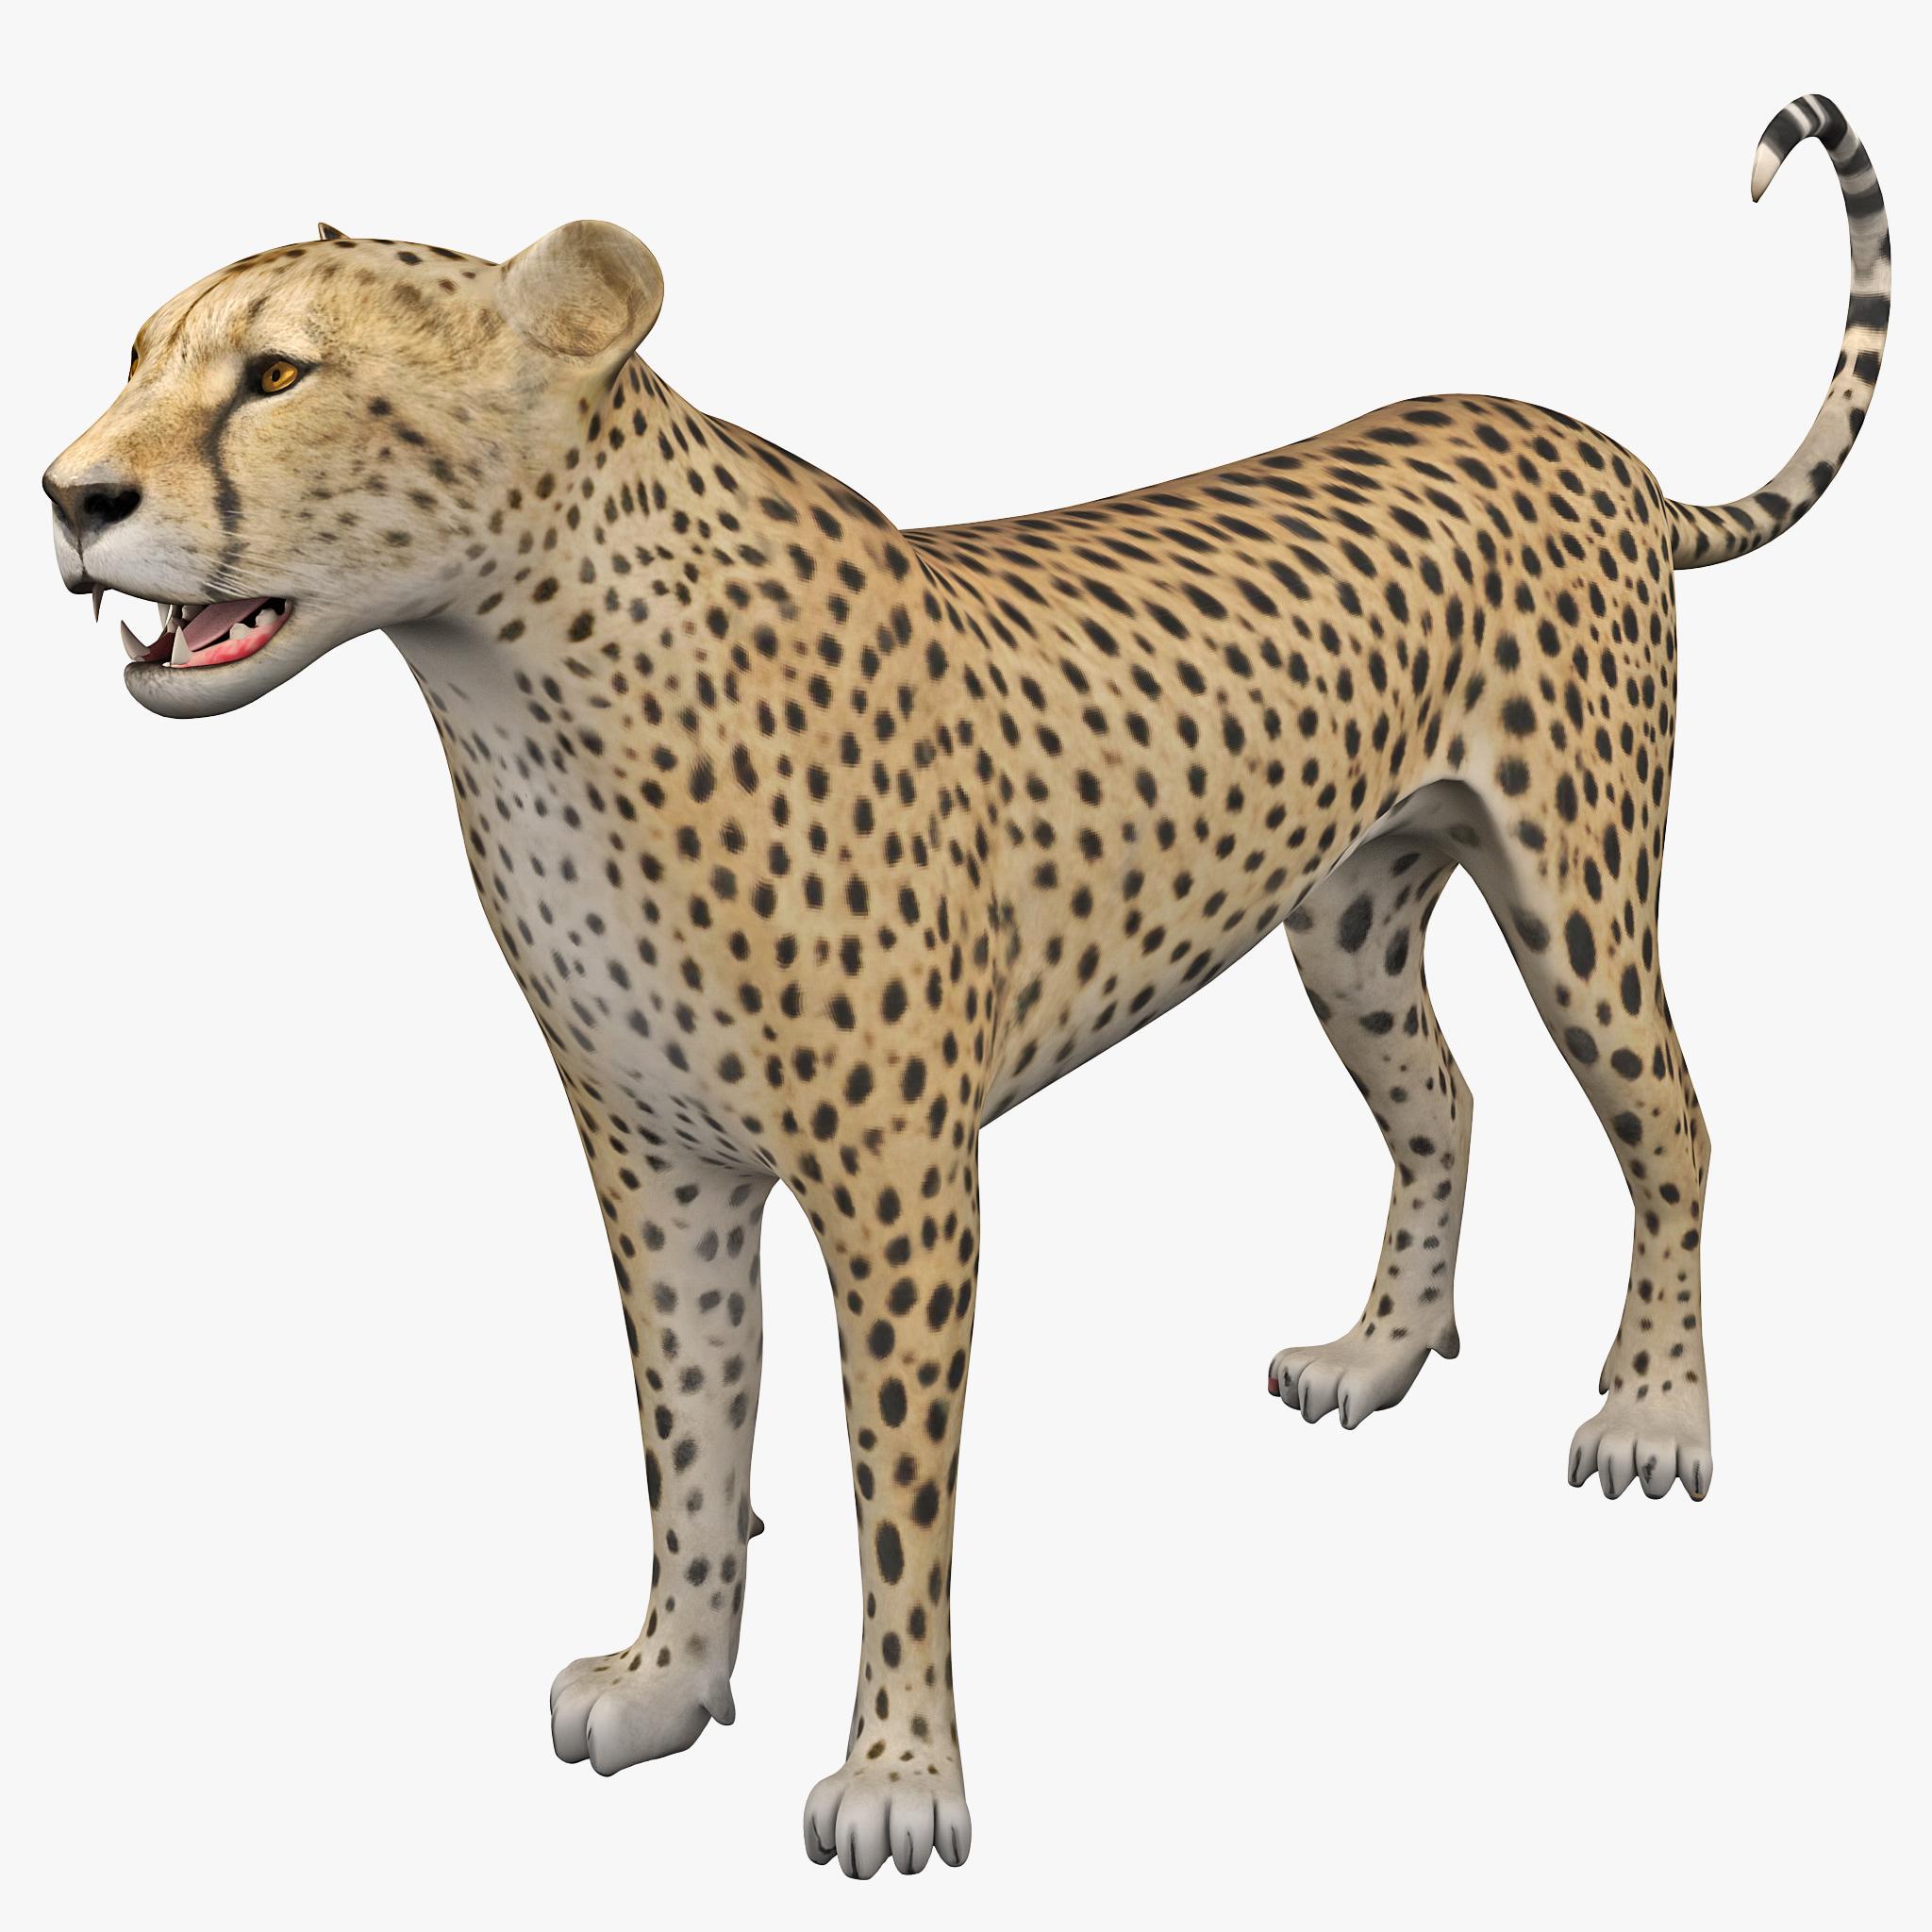 Cheetah 2 Rigged_1.jpg